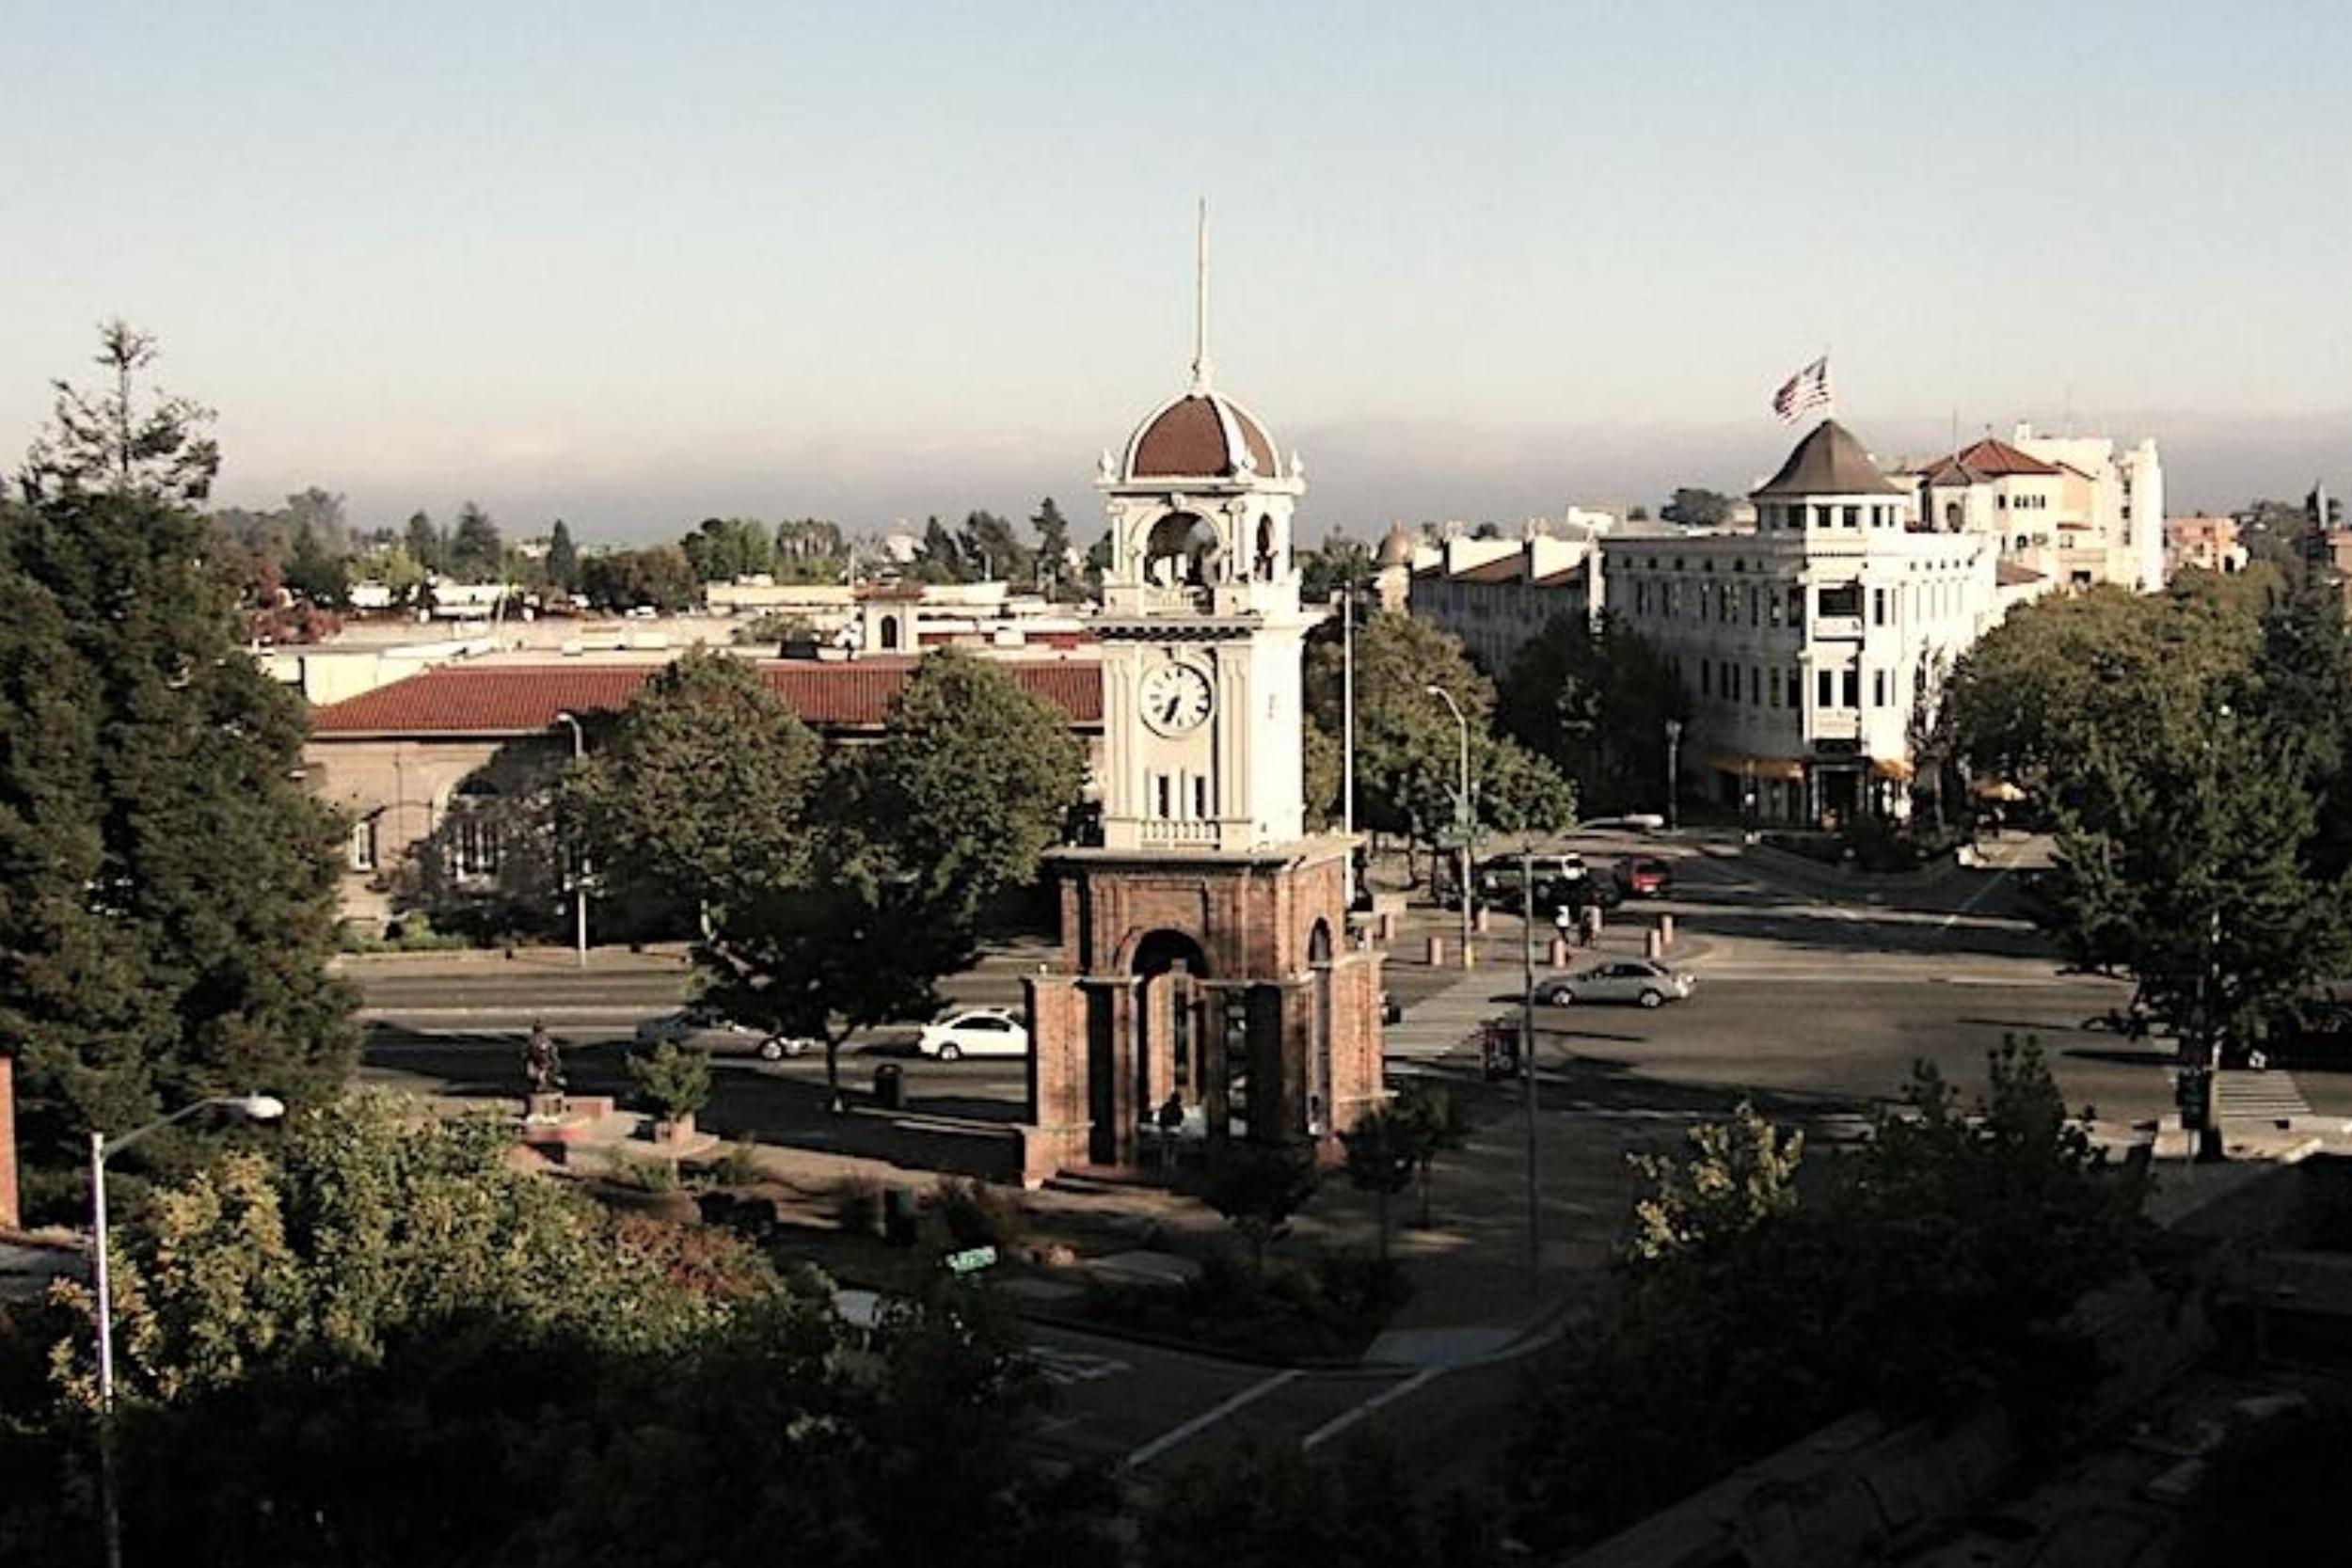 Downtown_santa_cruz_cropped.jpg